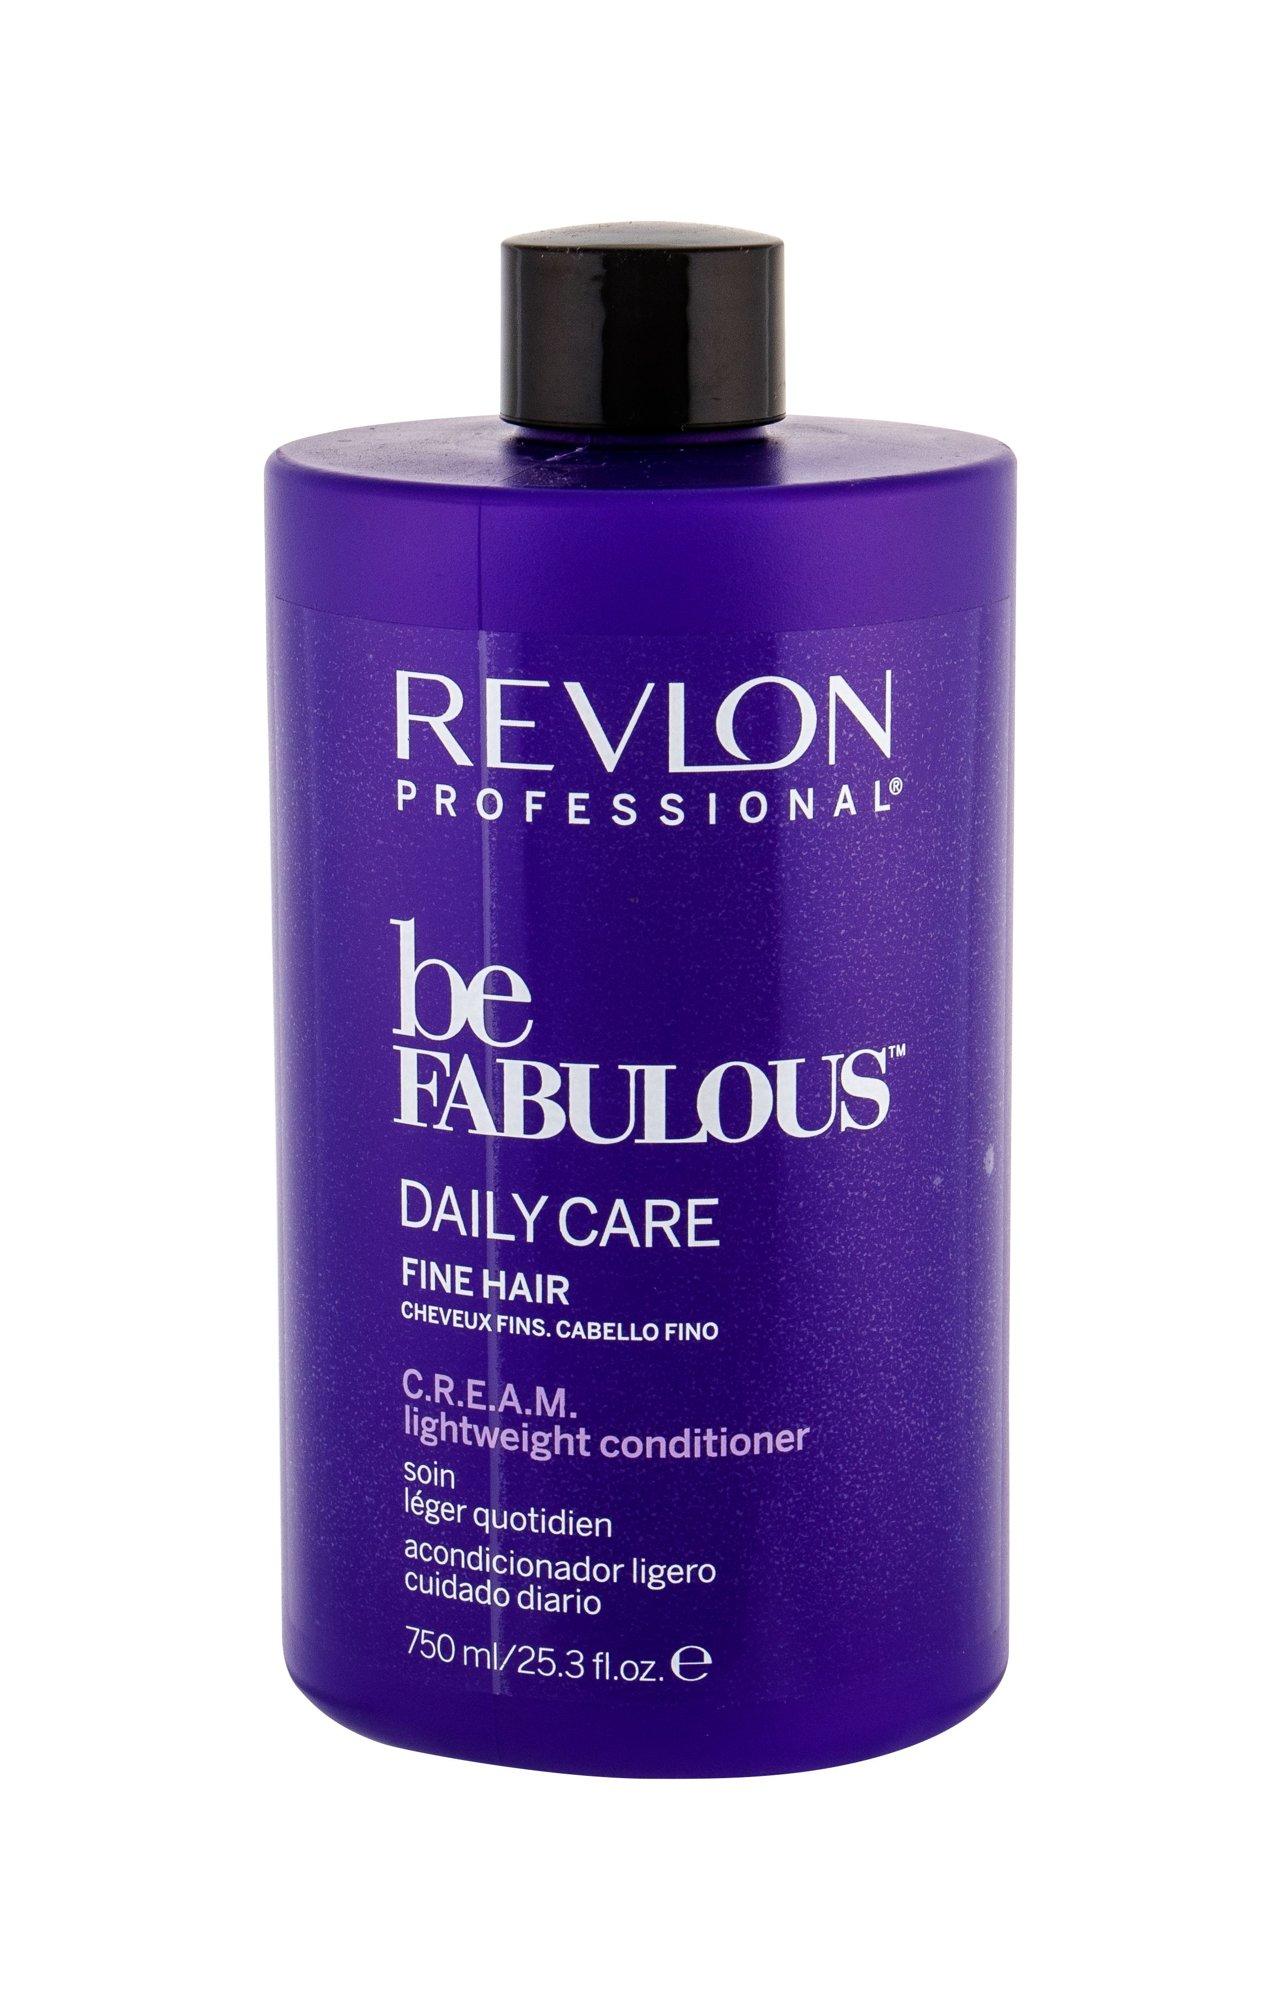 Revlon Professional Be Fabulous Conditioner 750ml